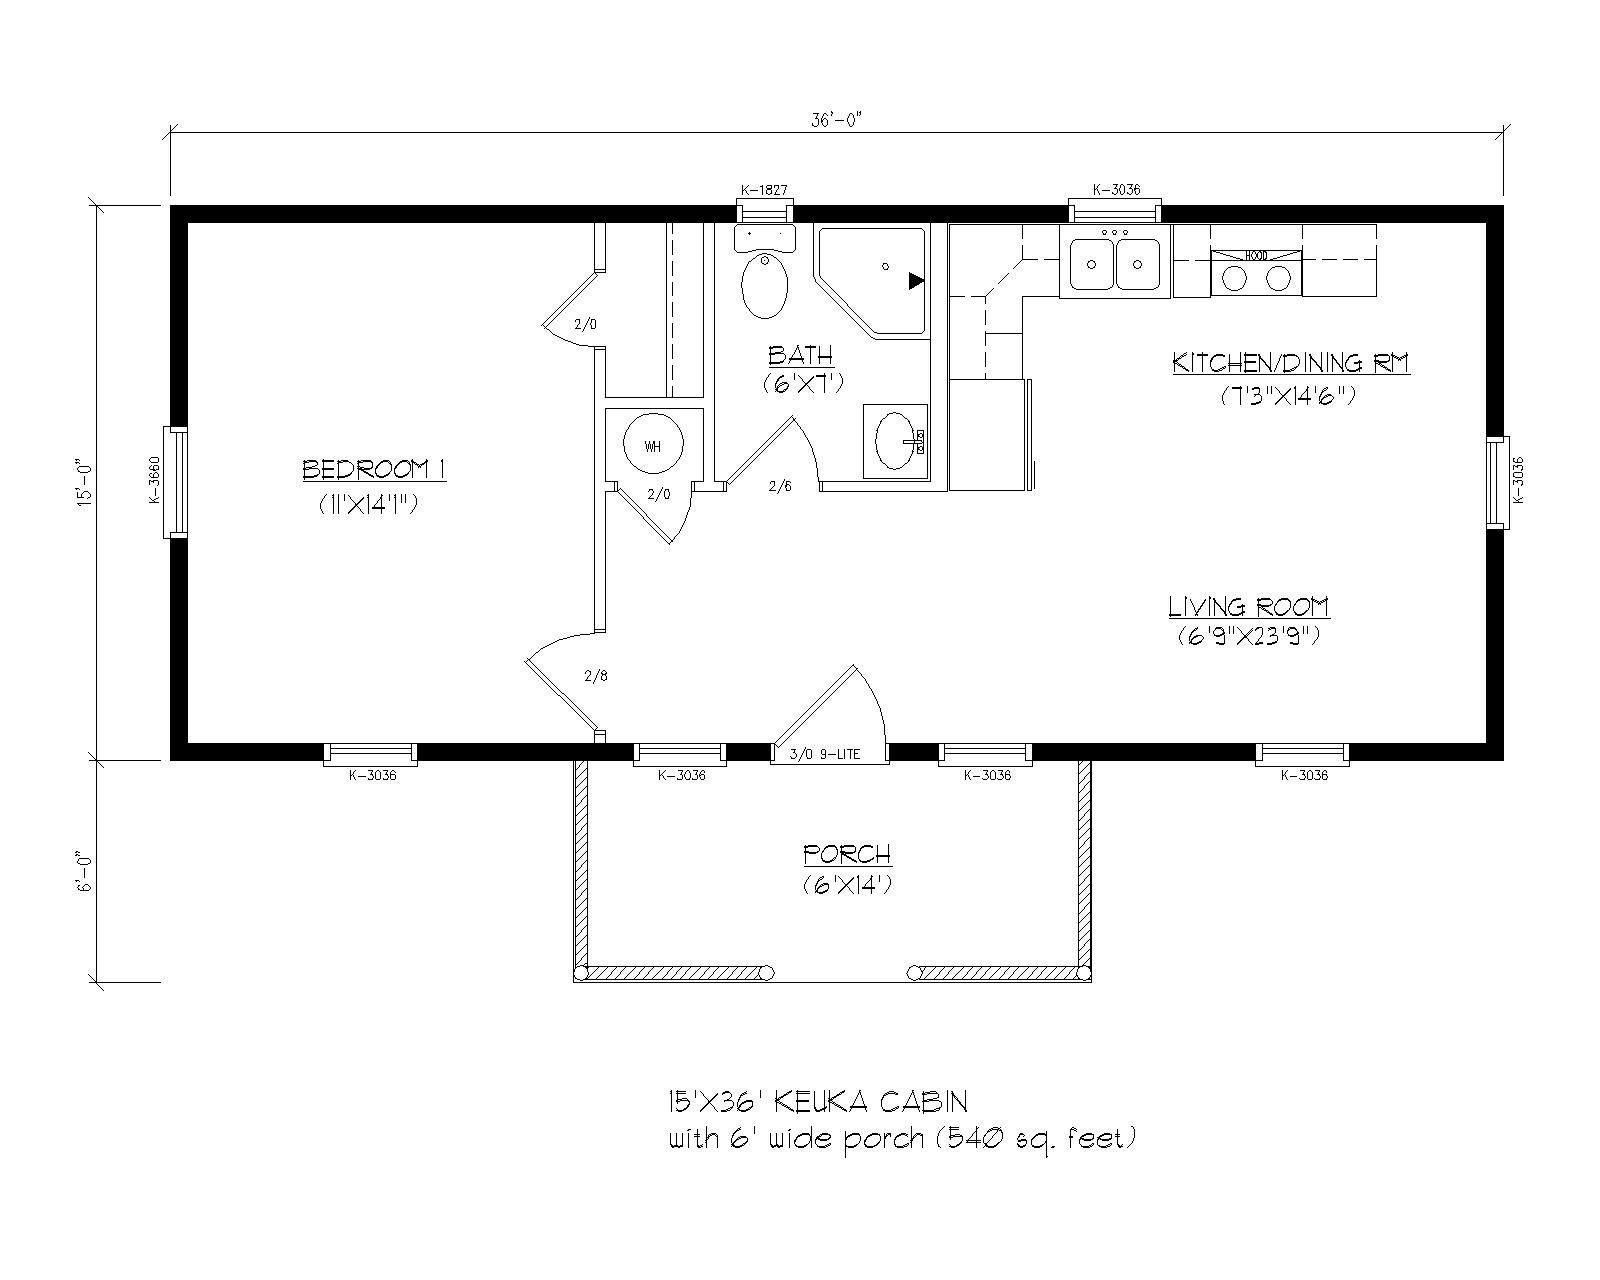 Riverwood Prefab Certified Modular Cabin Riverwood Cabins Cabin Floor Plans Floor Plans Modular Cabins